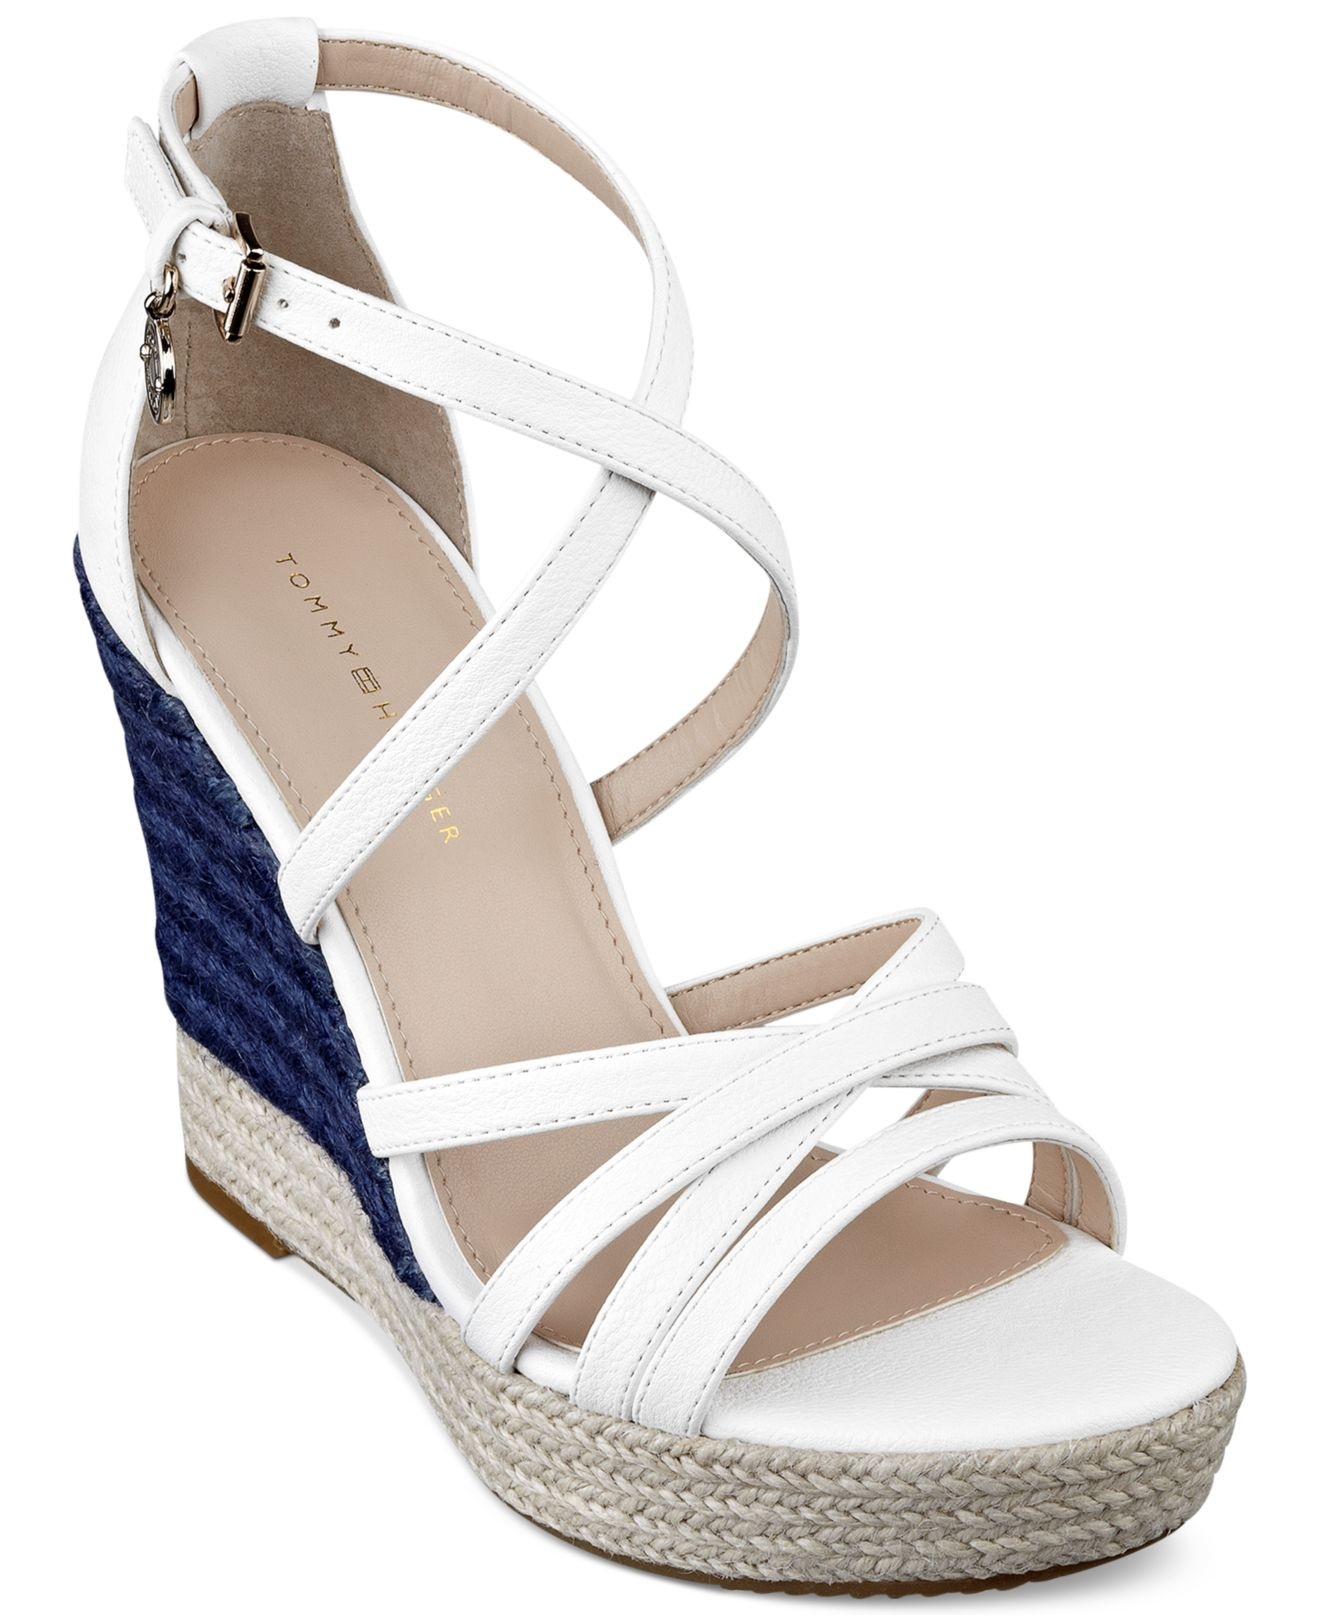 dc2bcd0d2035 Lyst - Tommy Hilfiger Women S Venitia Platform Wedge Sandals in White